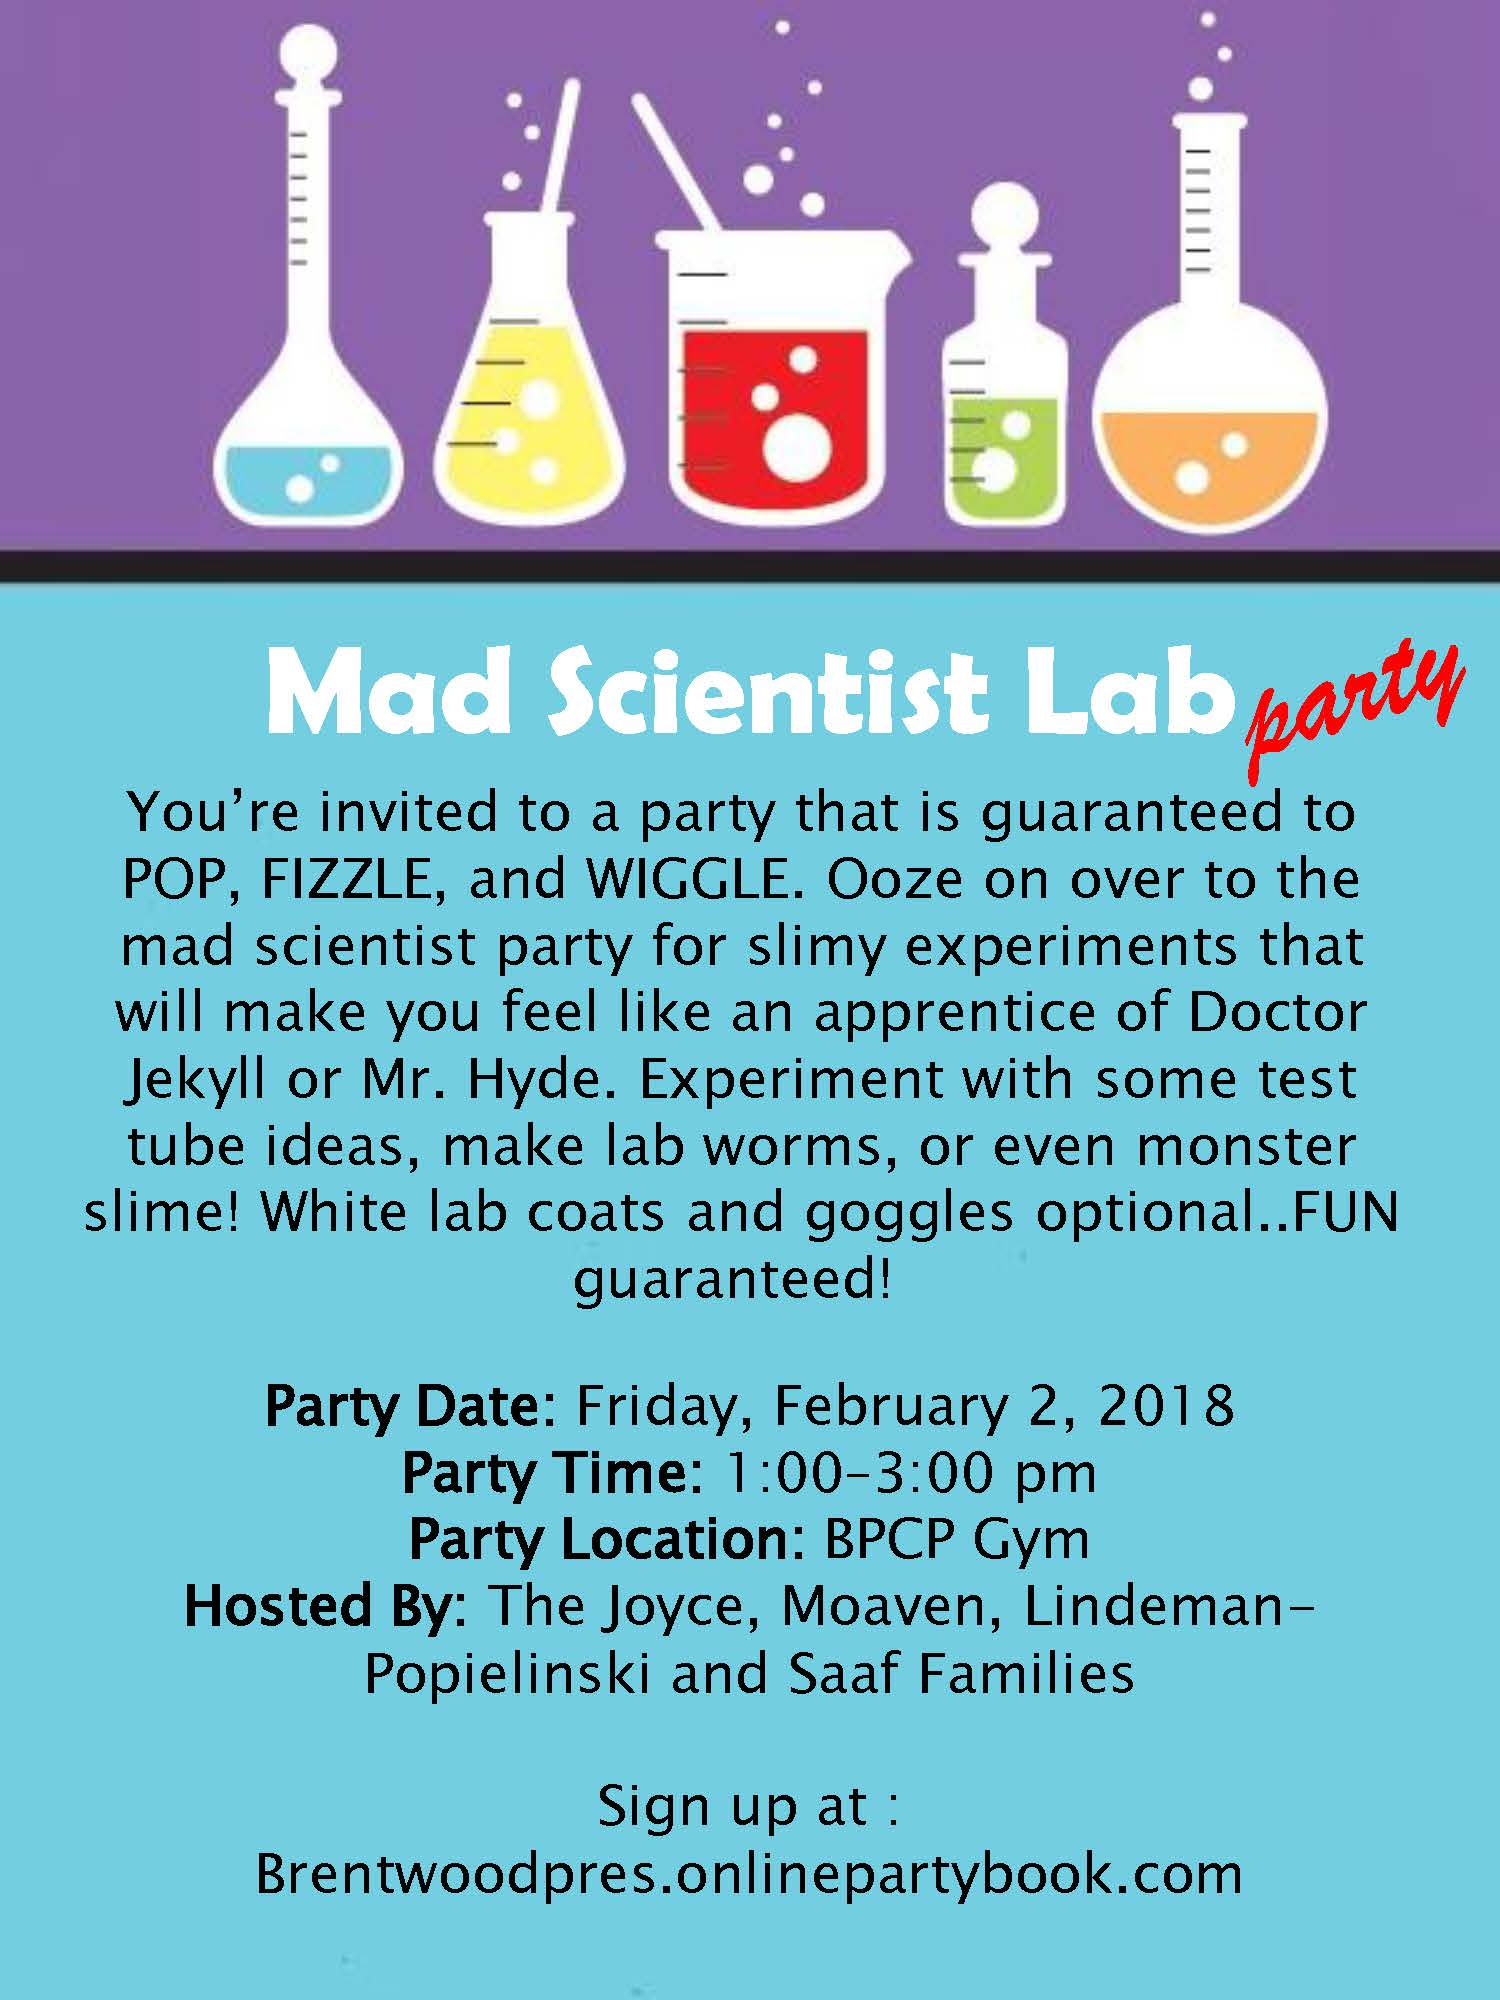 Mad Scientist Lab Party 02.02.18.jpg